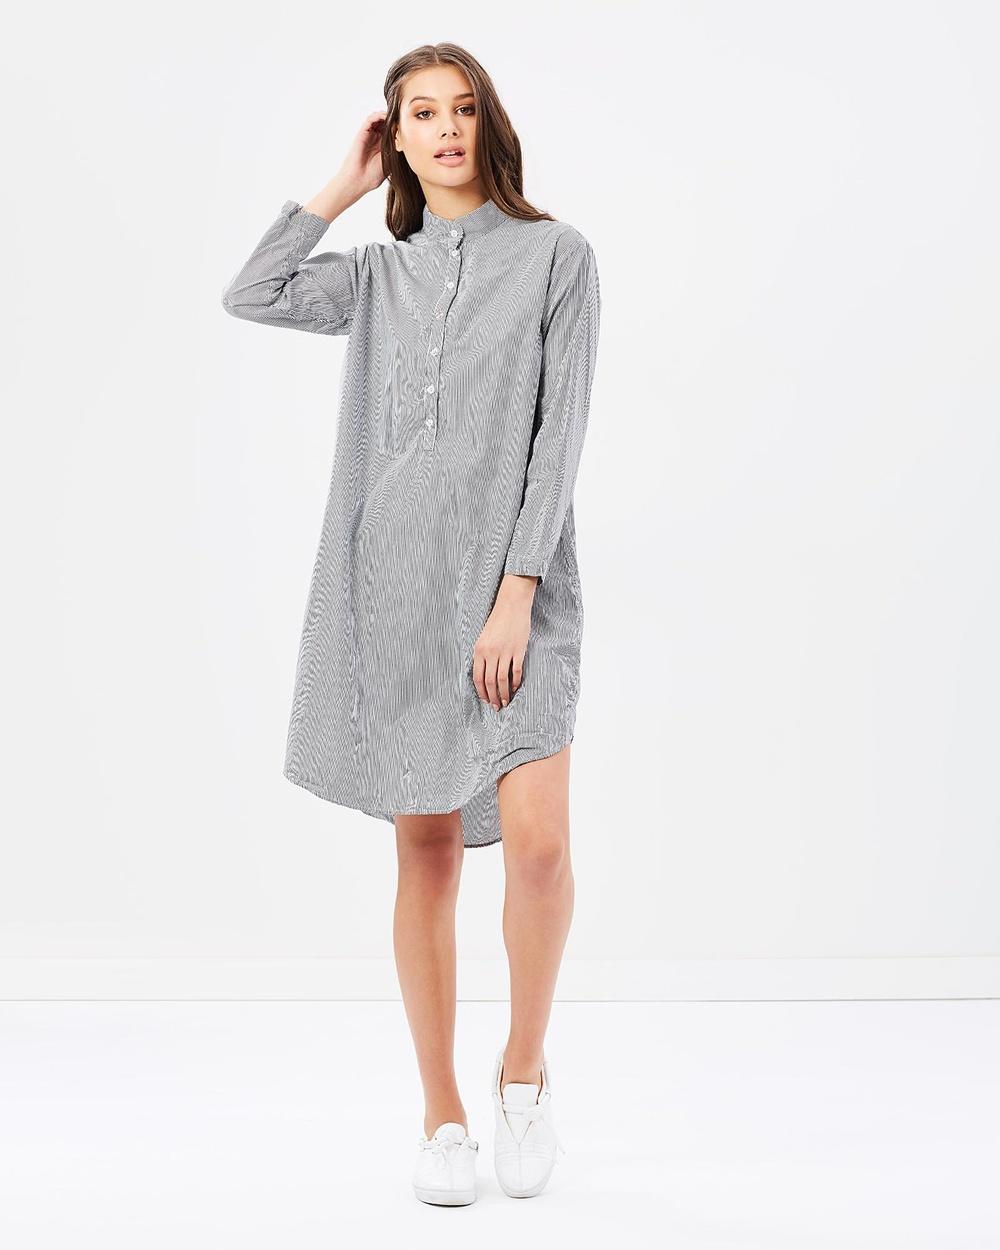 Primness Pinstripe Dress Dresses Black Fine Stripe Pinstripe Dress